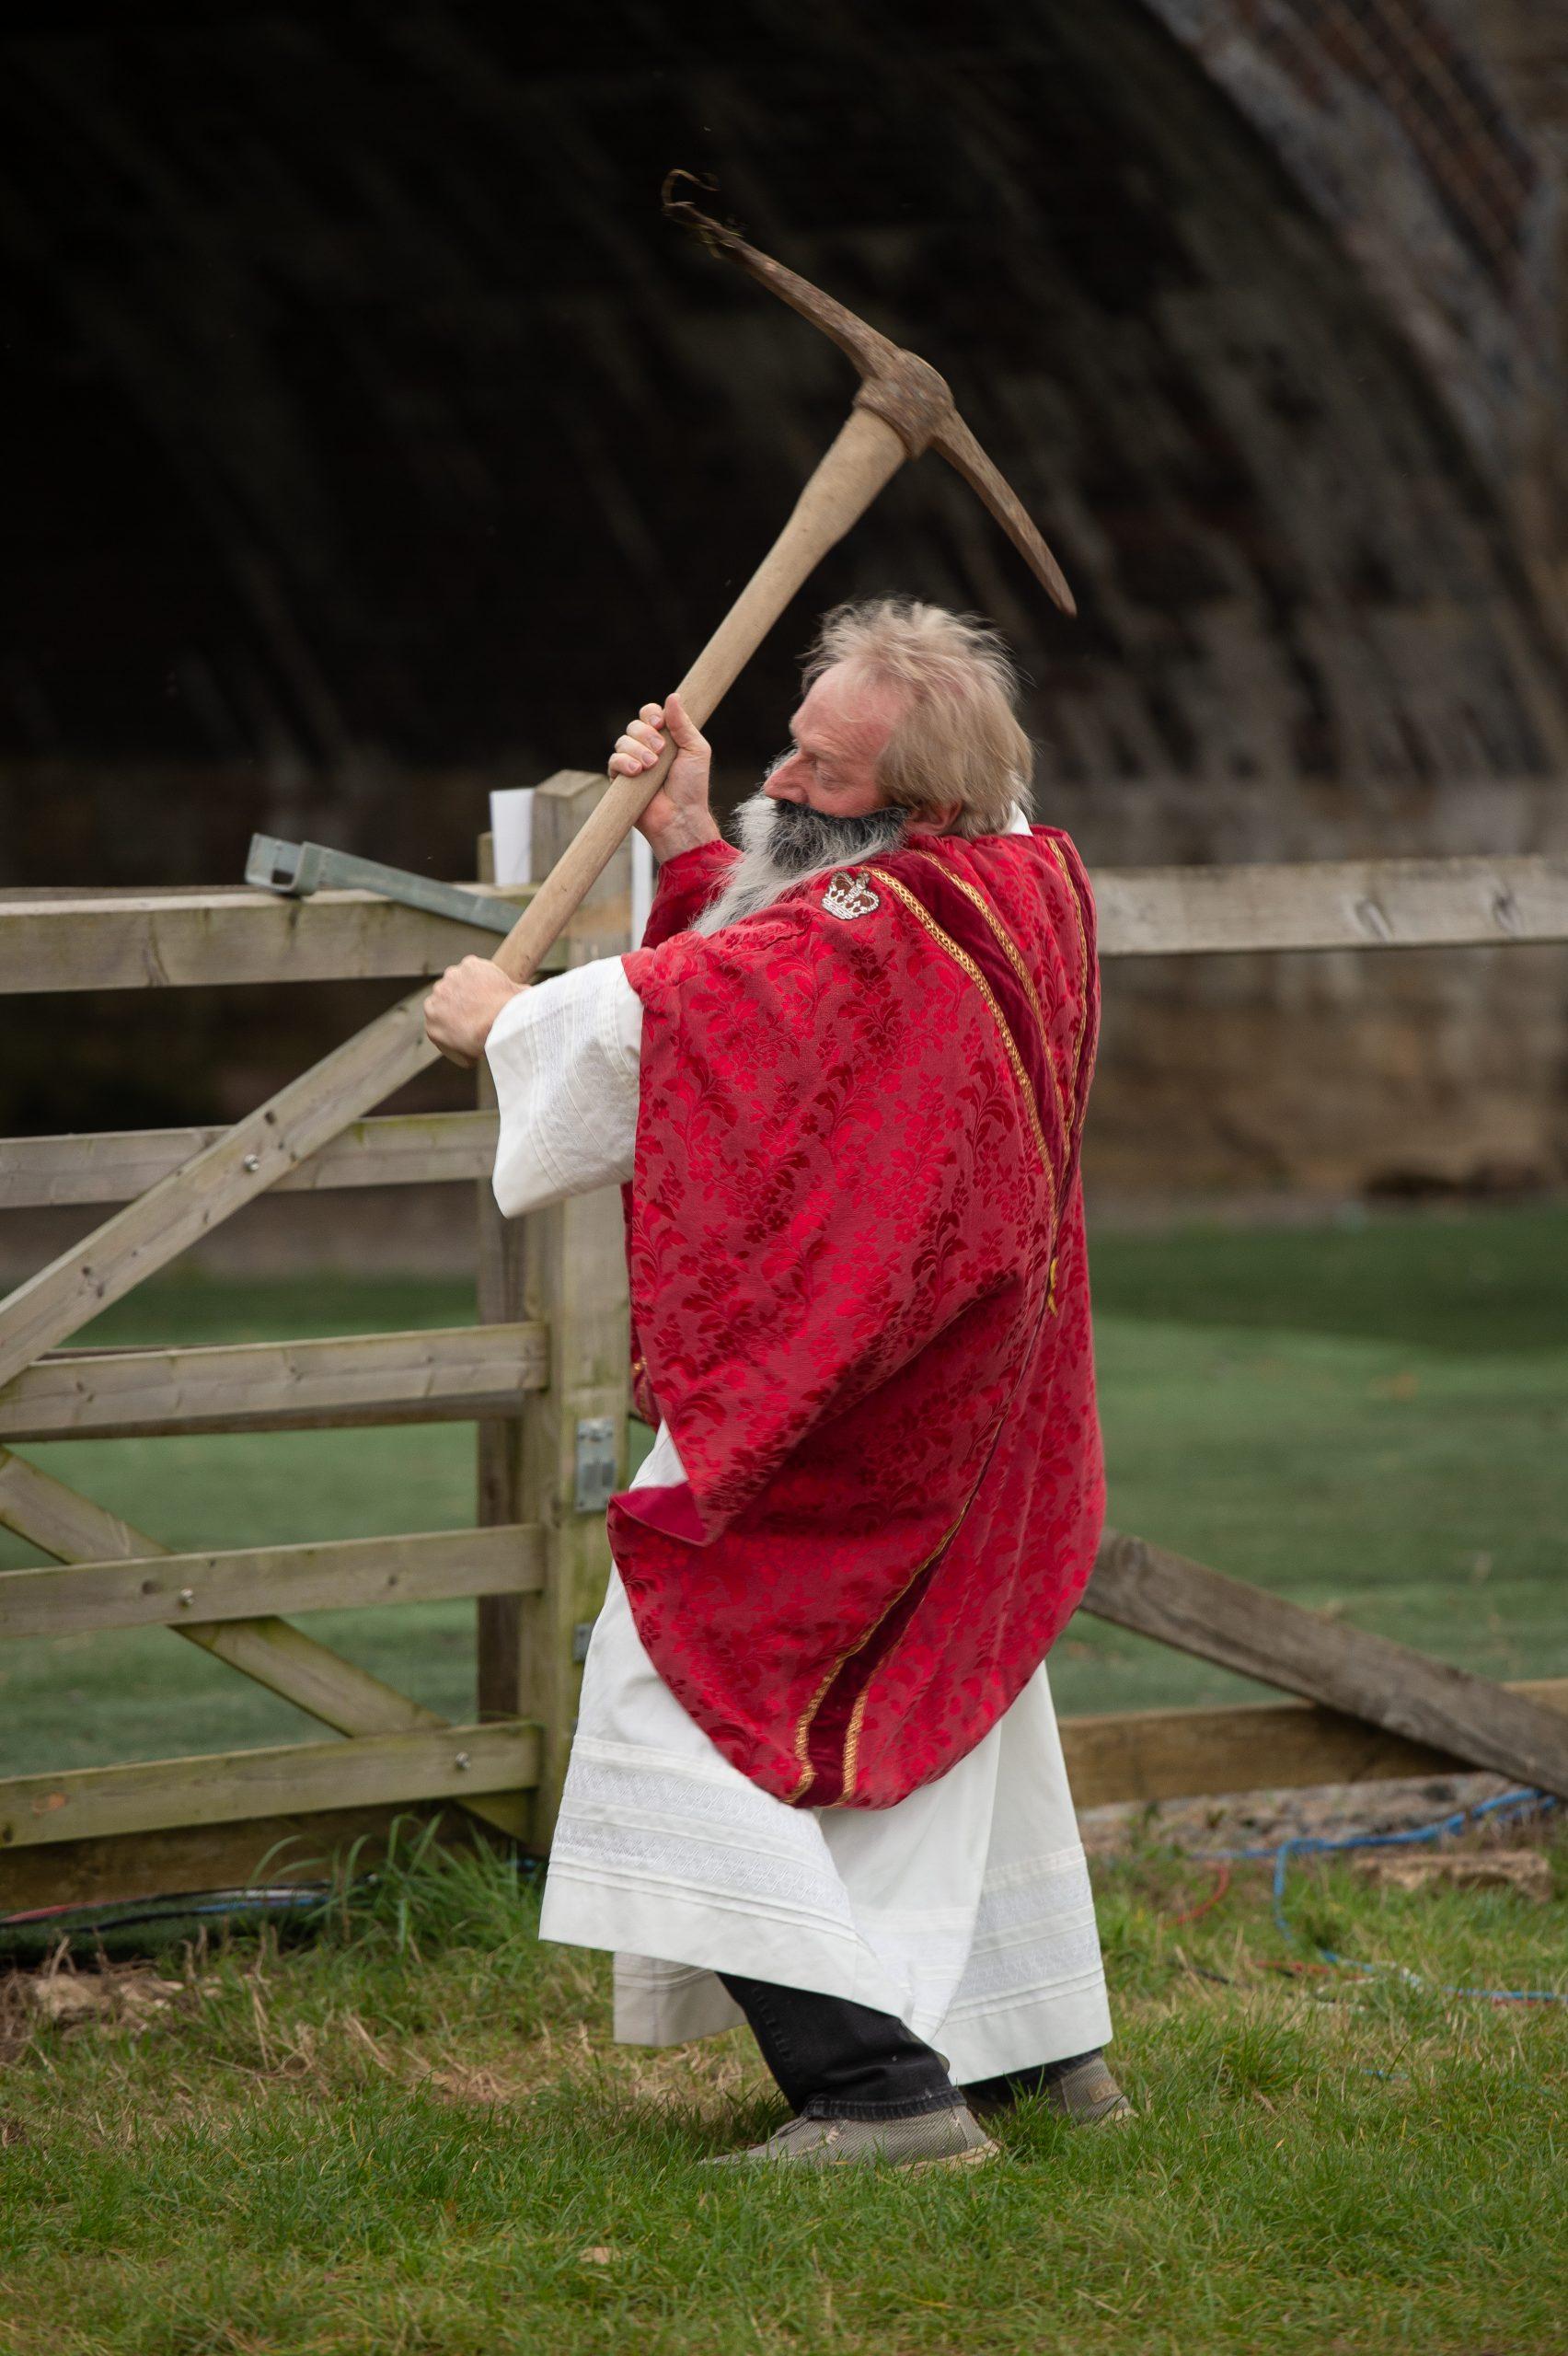 MKTOC - More Ripping Yarns - Chaplain